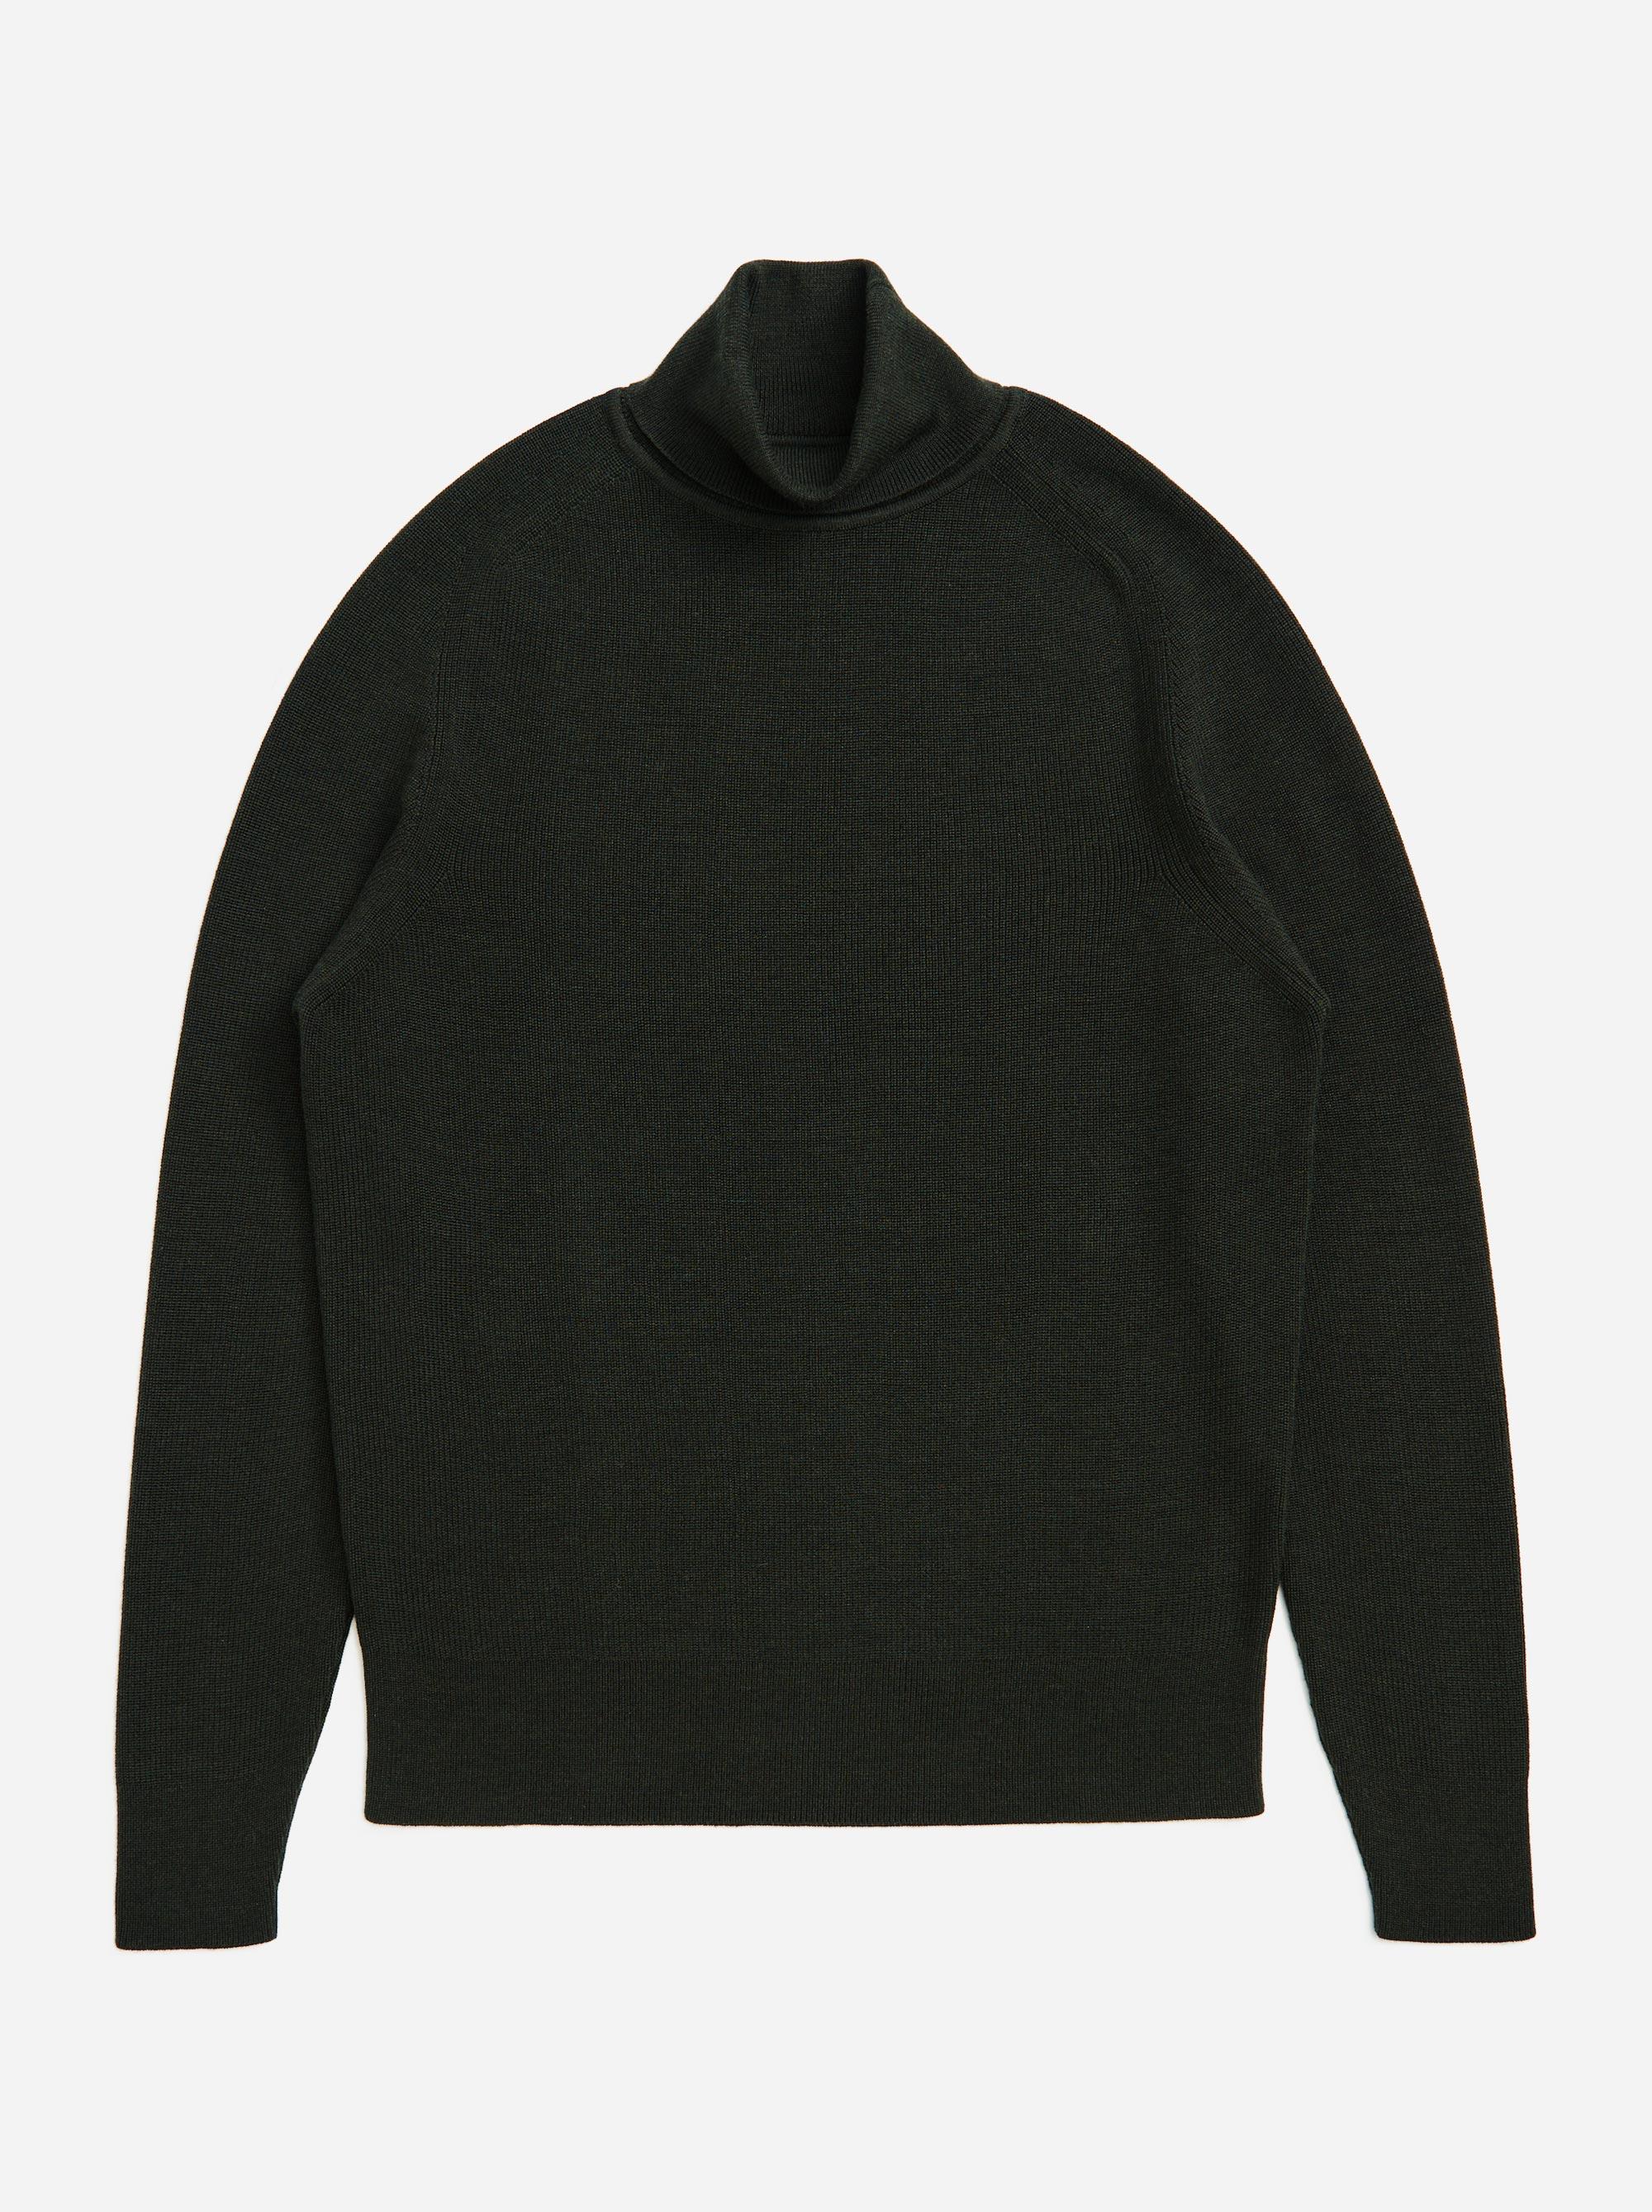 Teym - Turtleneck - The Merino Sweater - Men - Green - 5